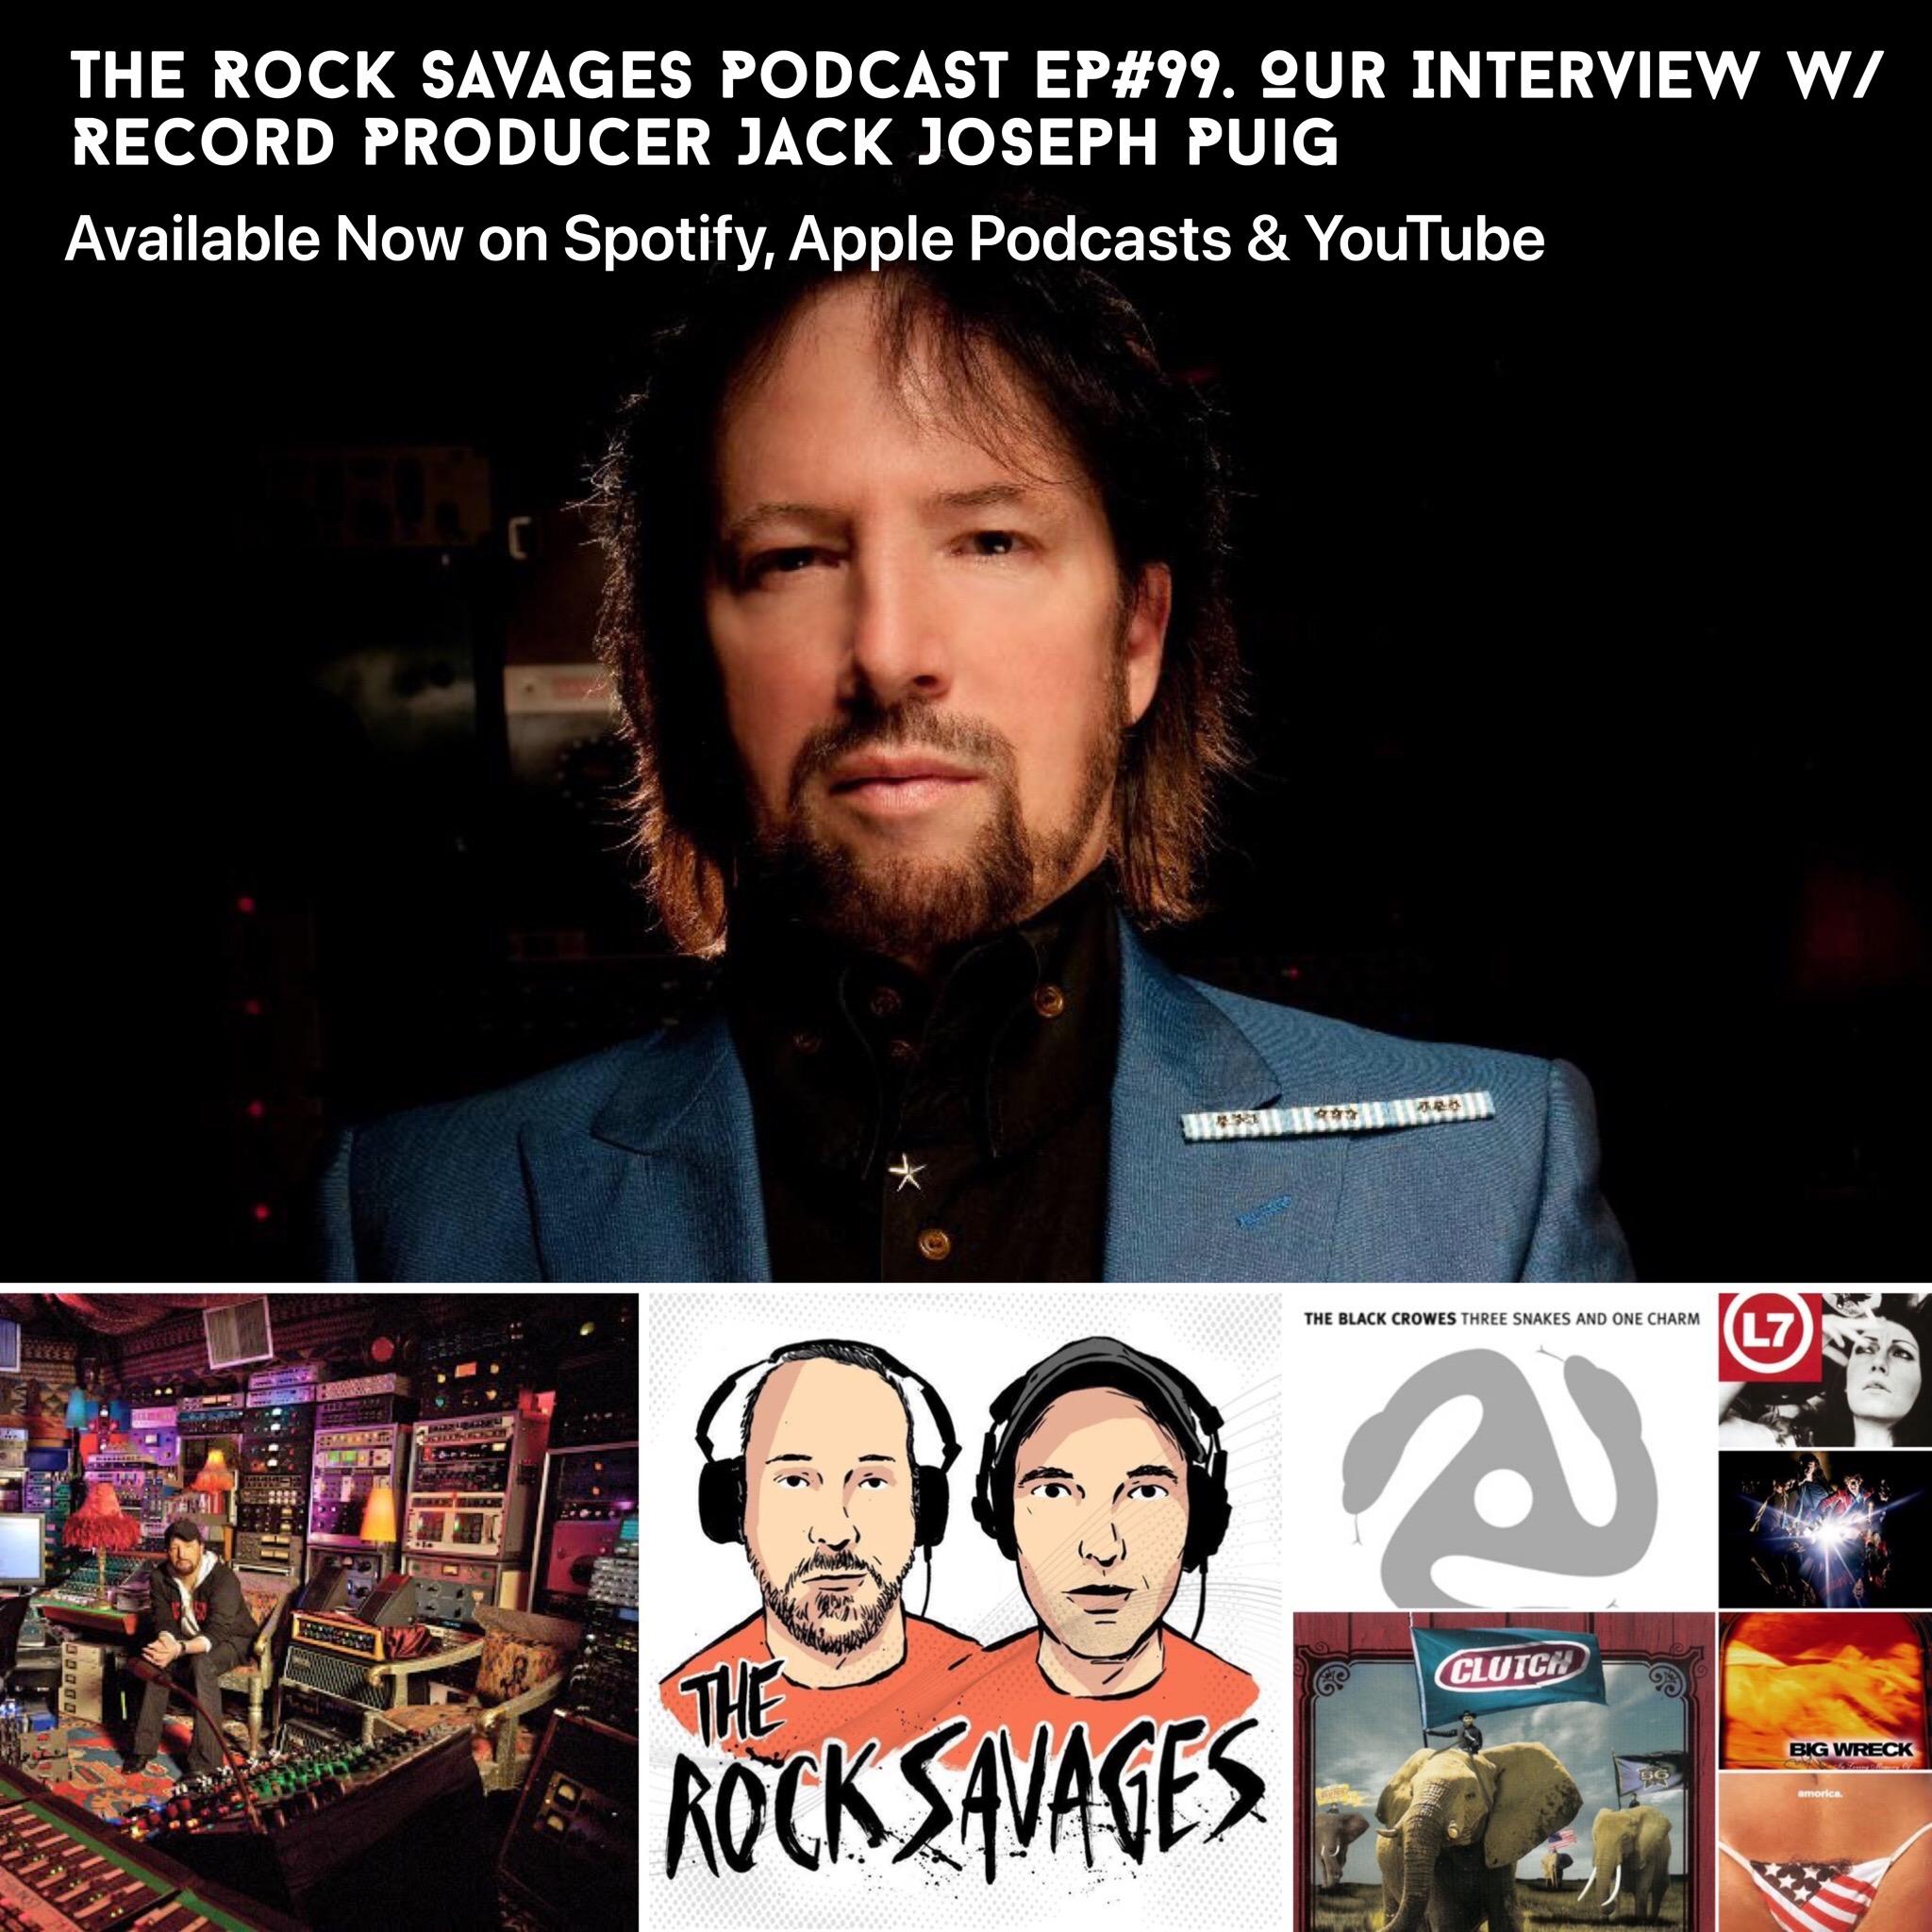 The Rock Savages Talk to Legendary Record Producer Jack Joseph Puig